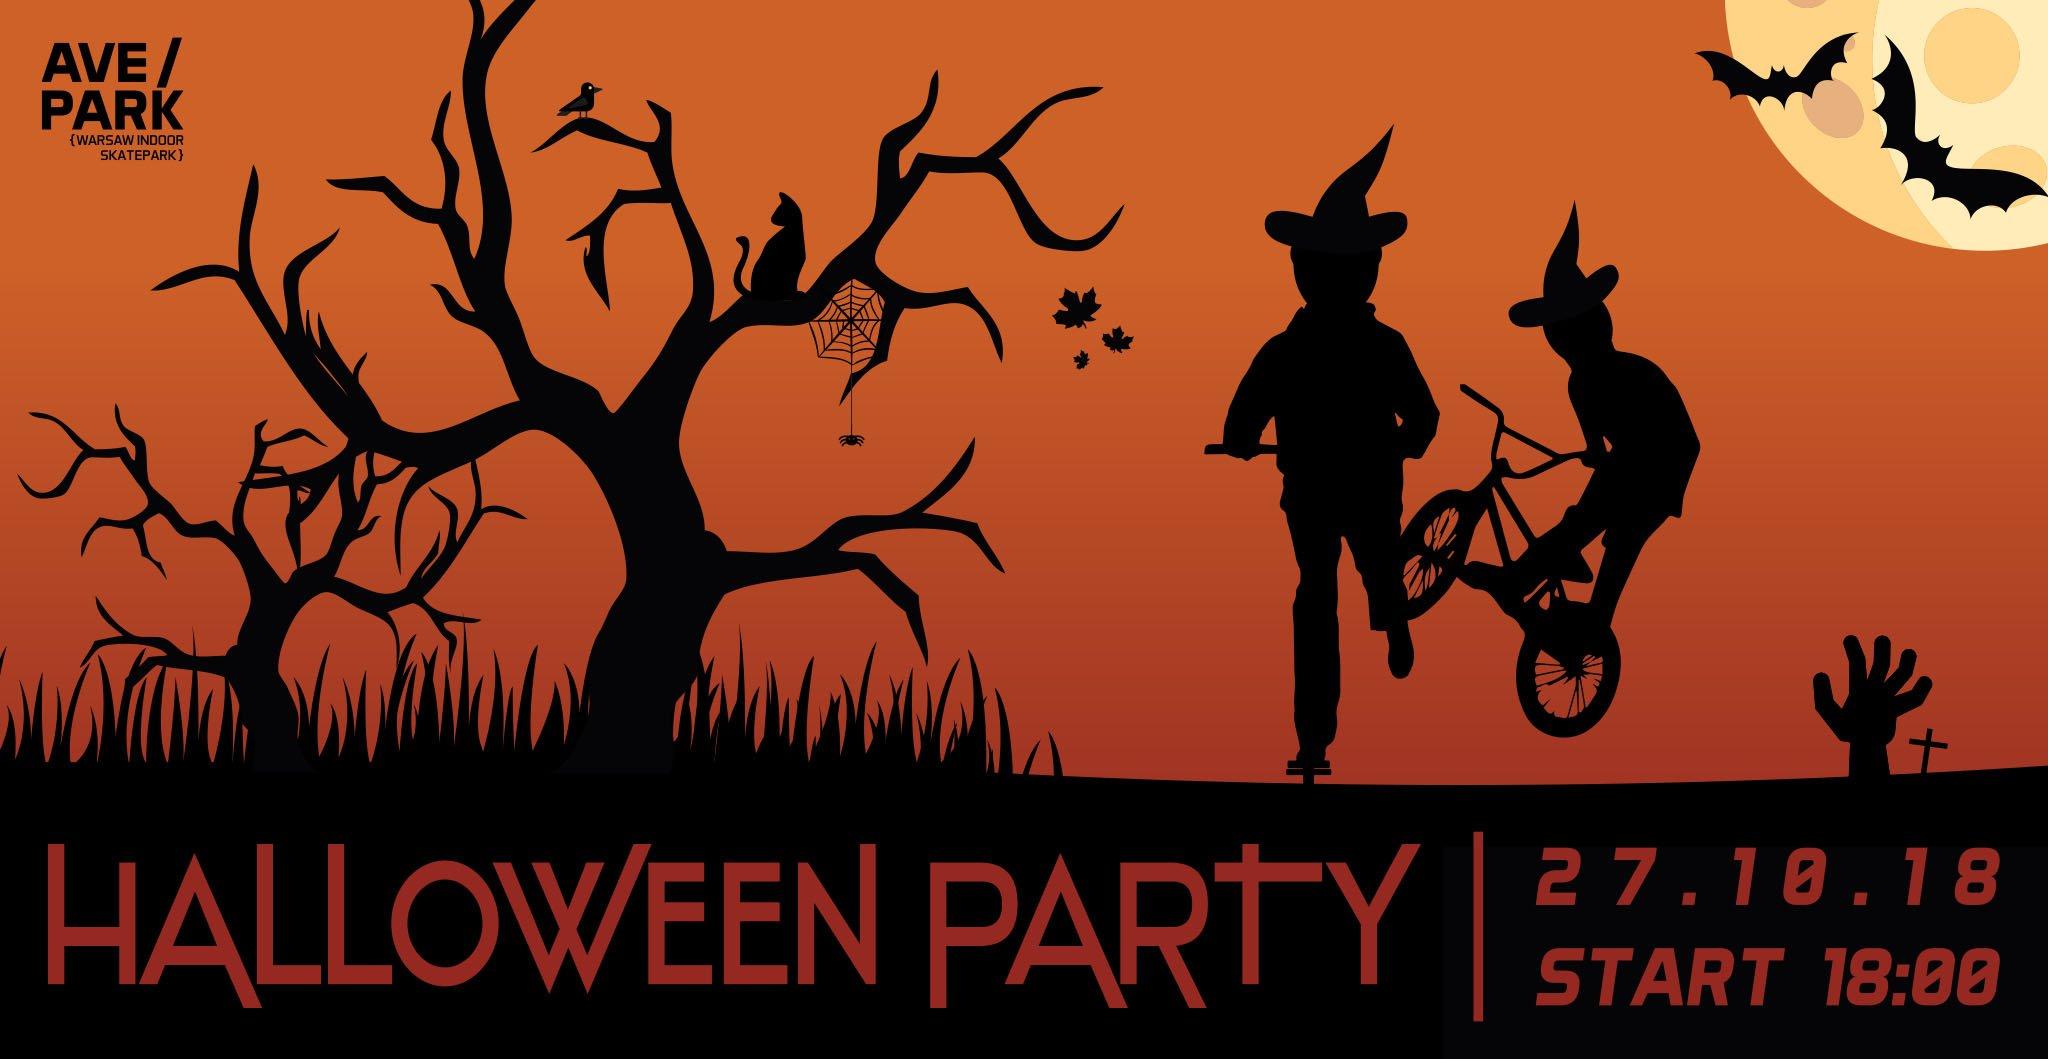 Halloween Party na AvePark - 27/10/2018